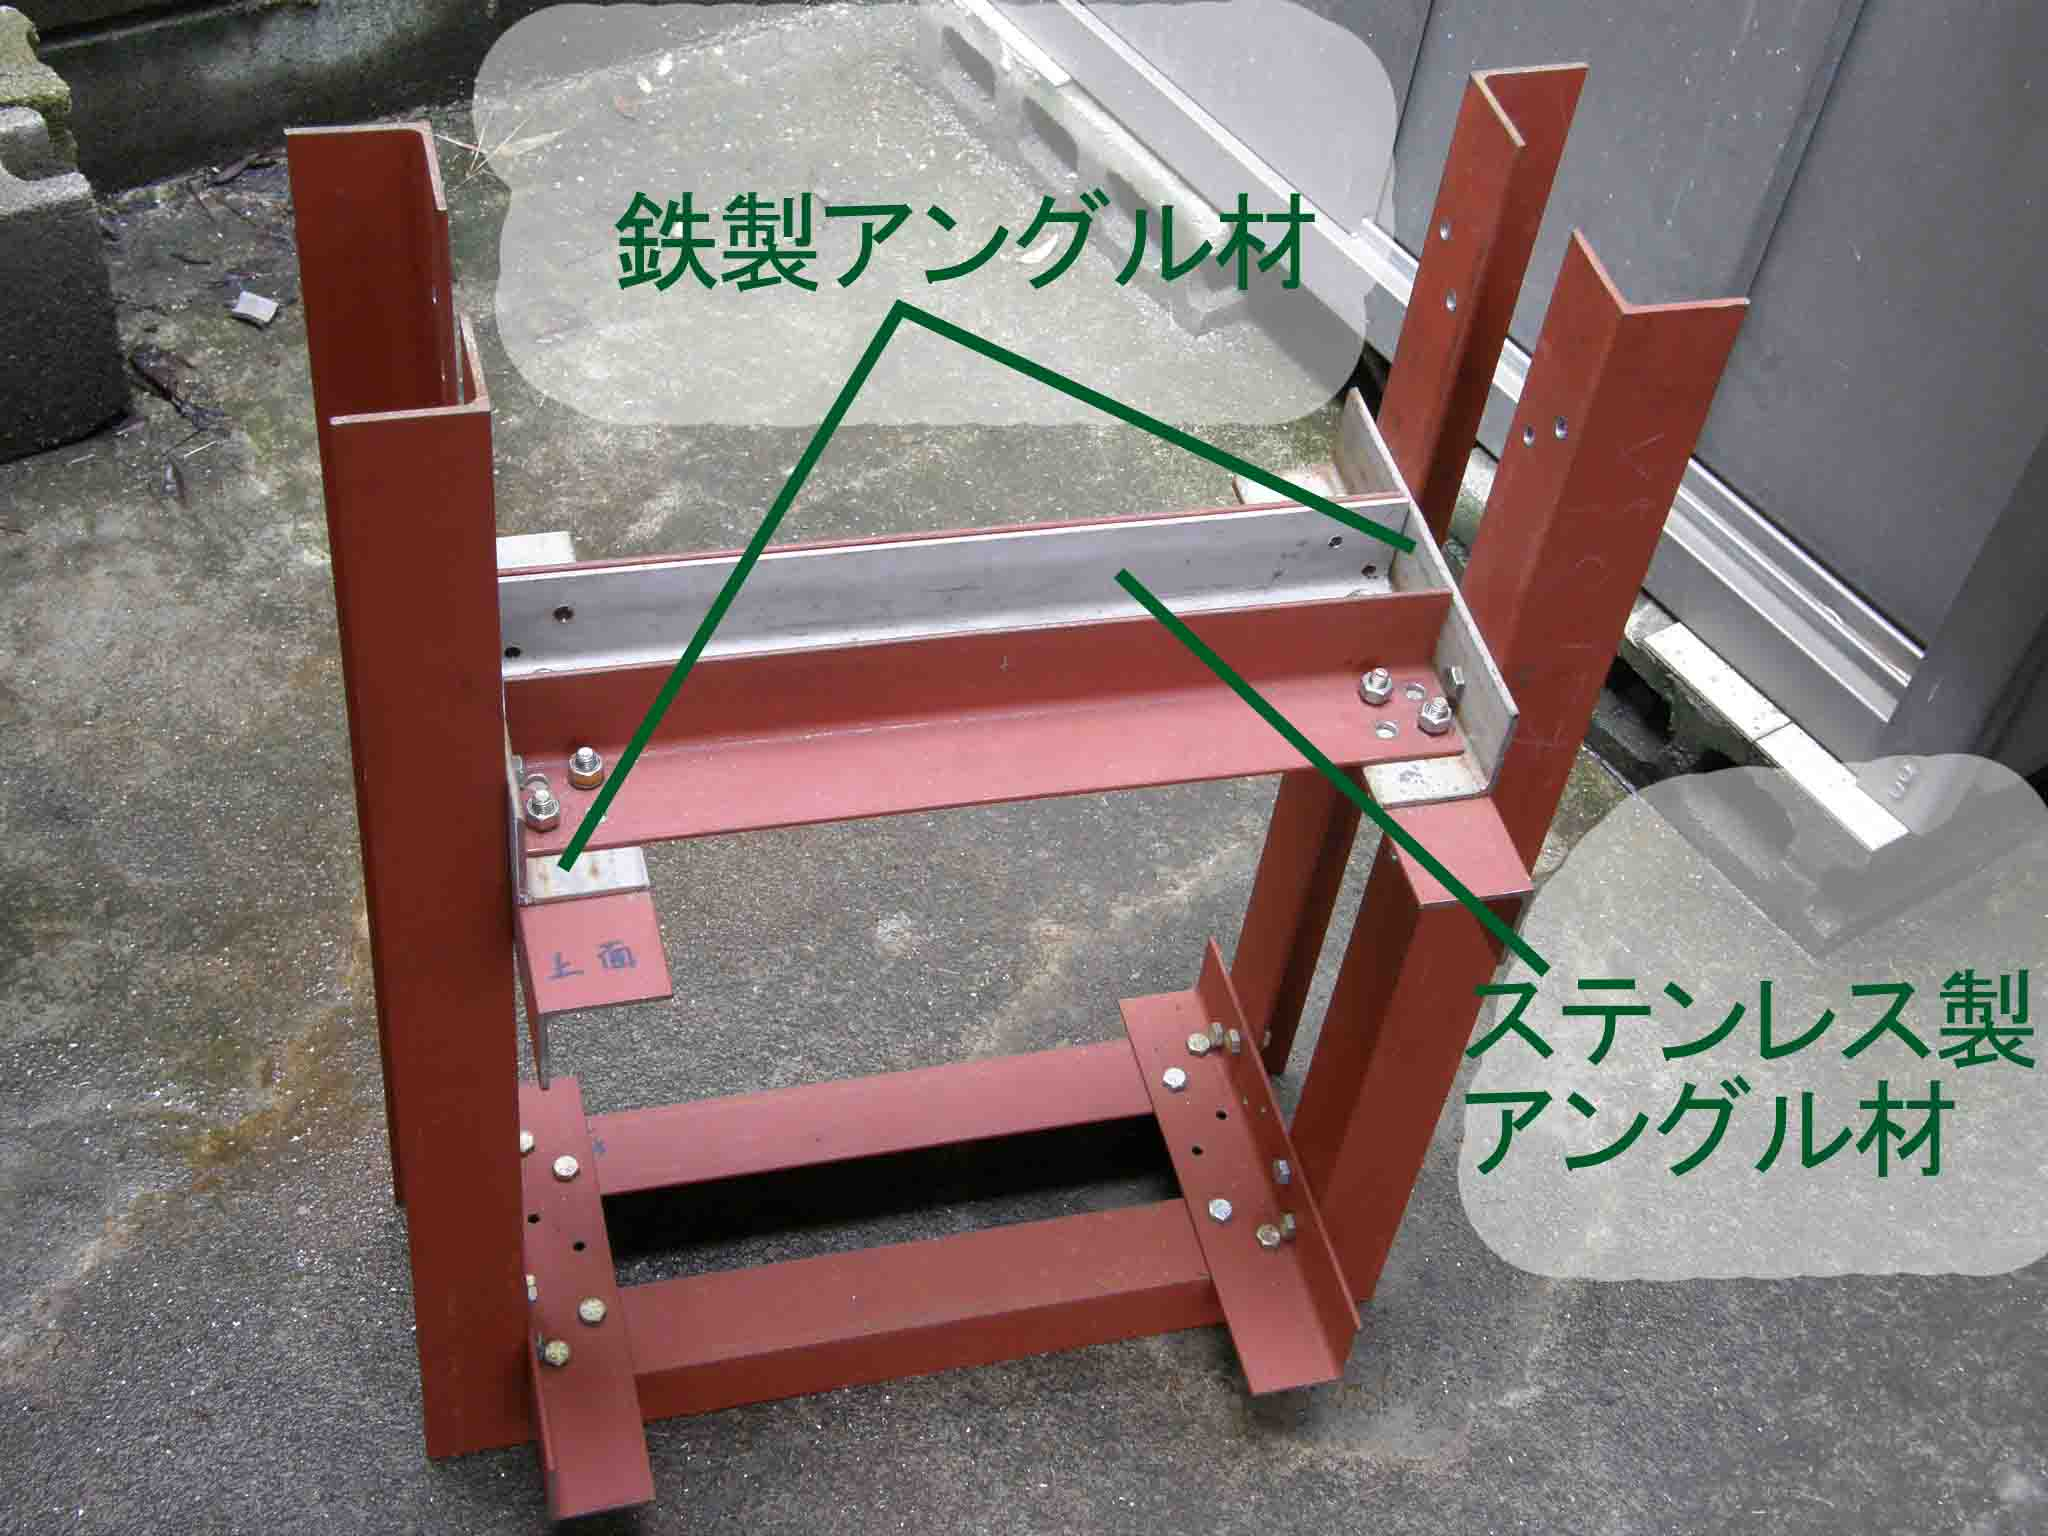 blogP6300448.jpg